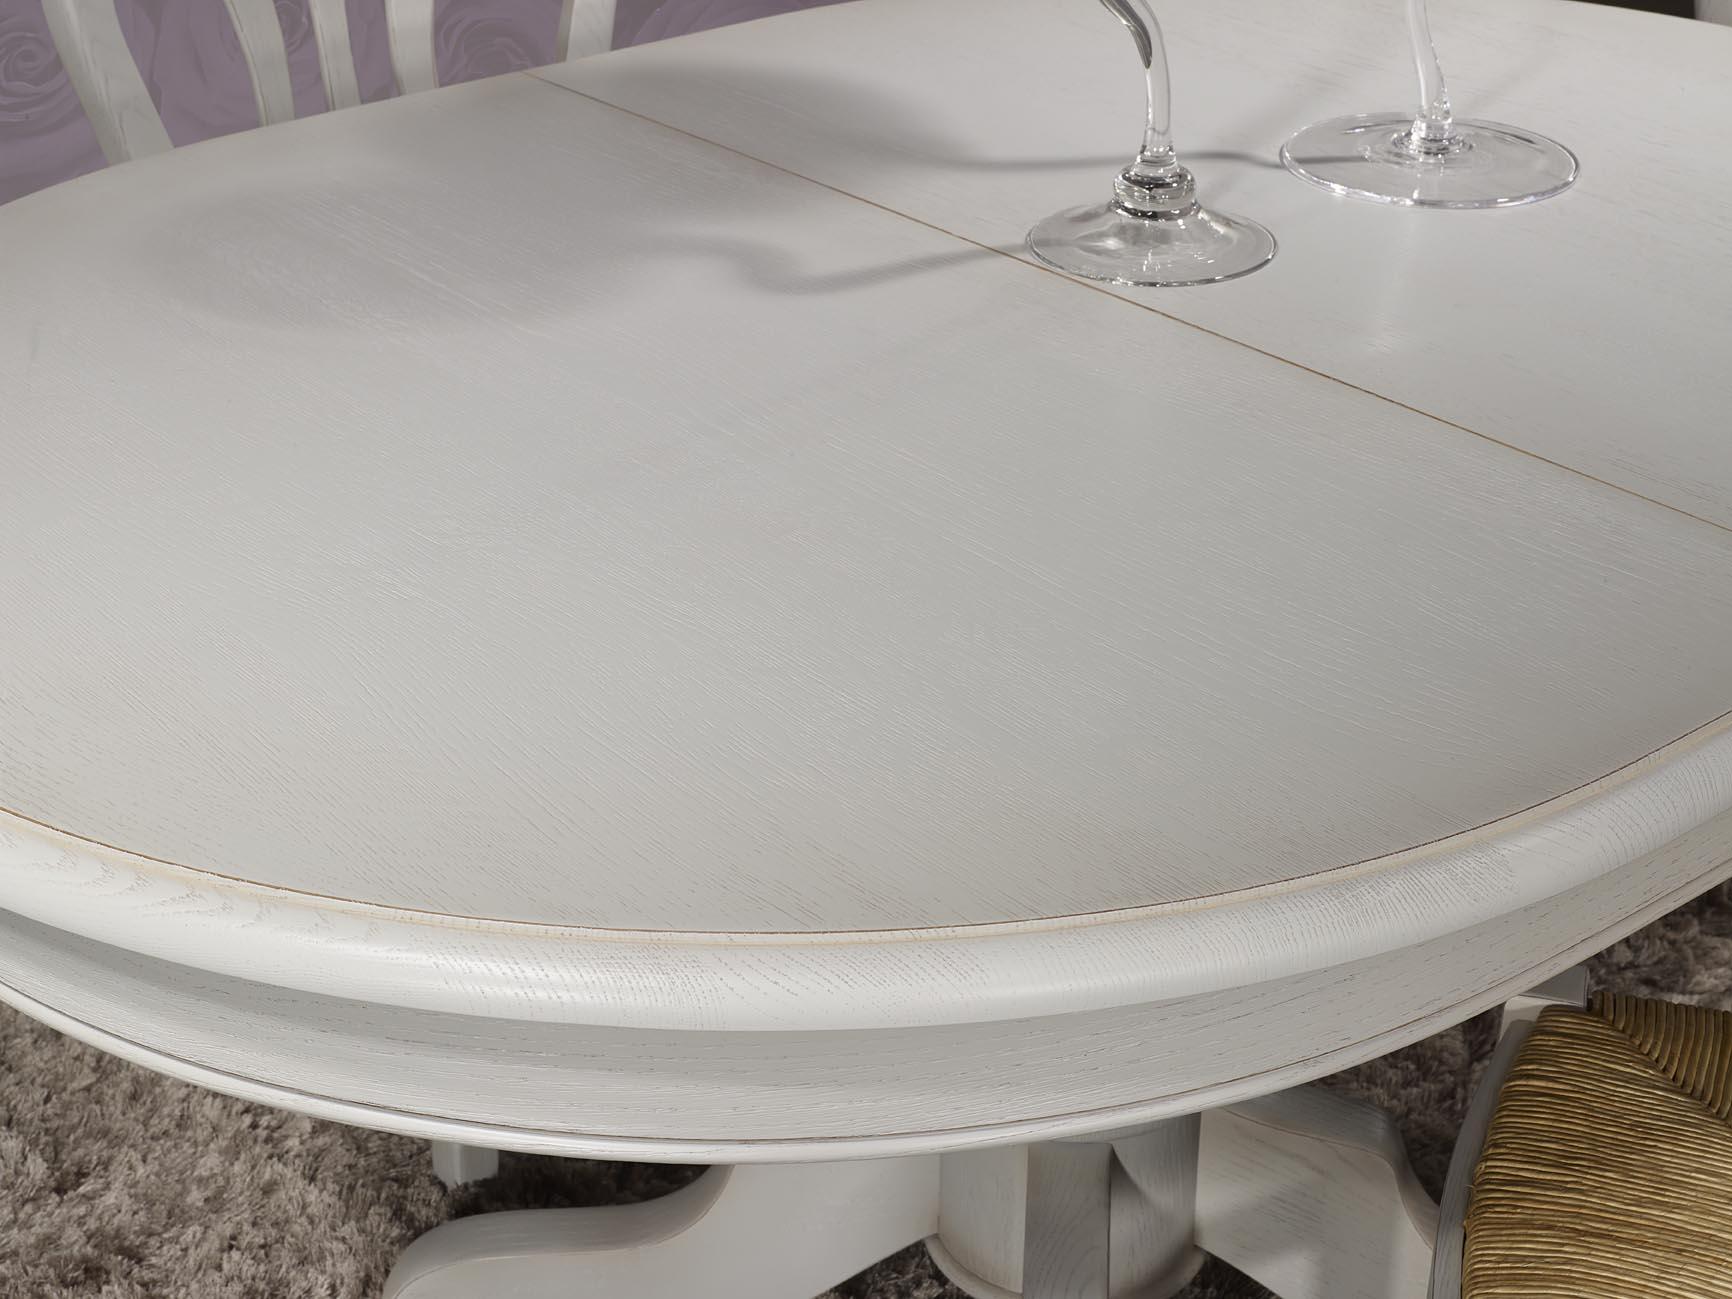 table ovale pied central romain en ch ne massif de style. Black Bedroom Furniture Sets. Home Design Ideas